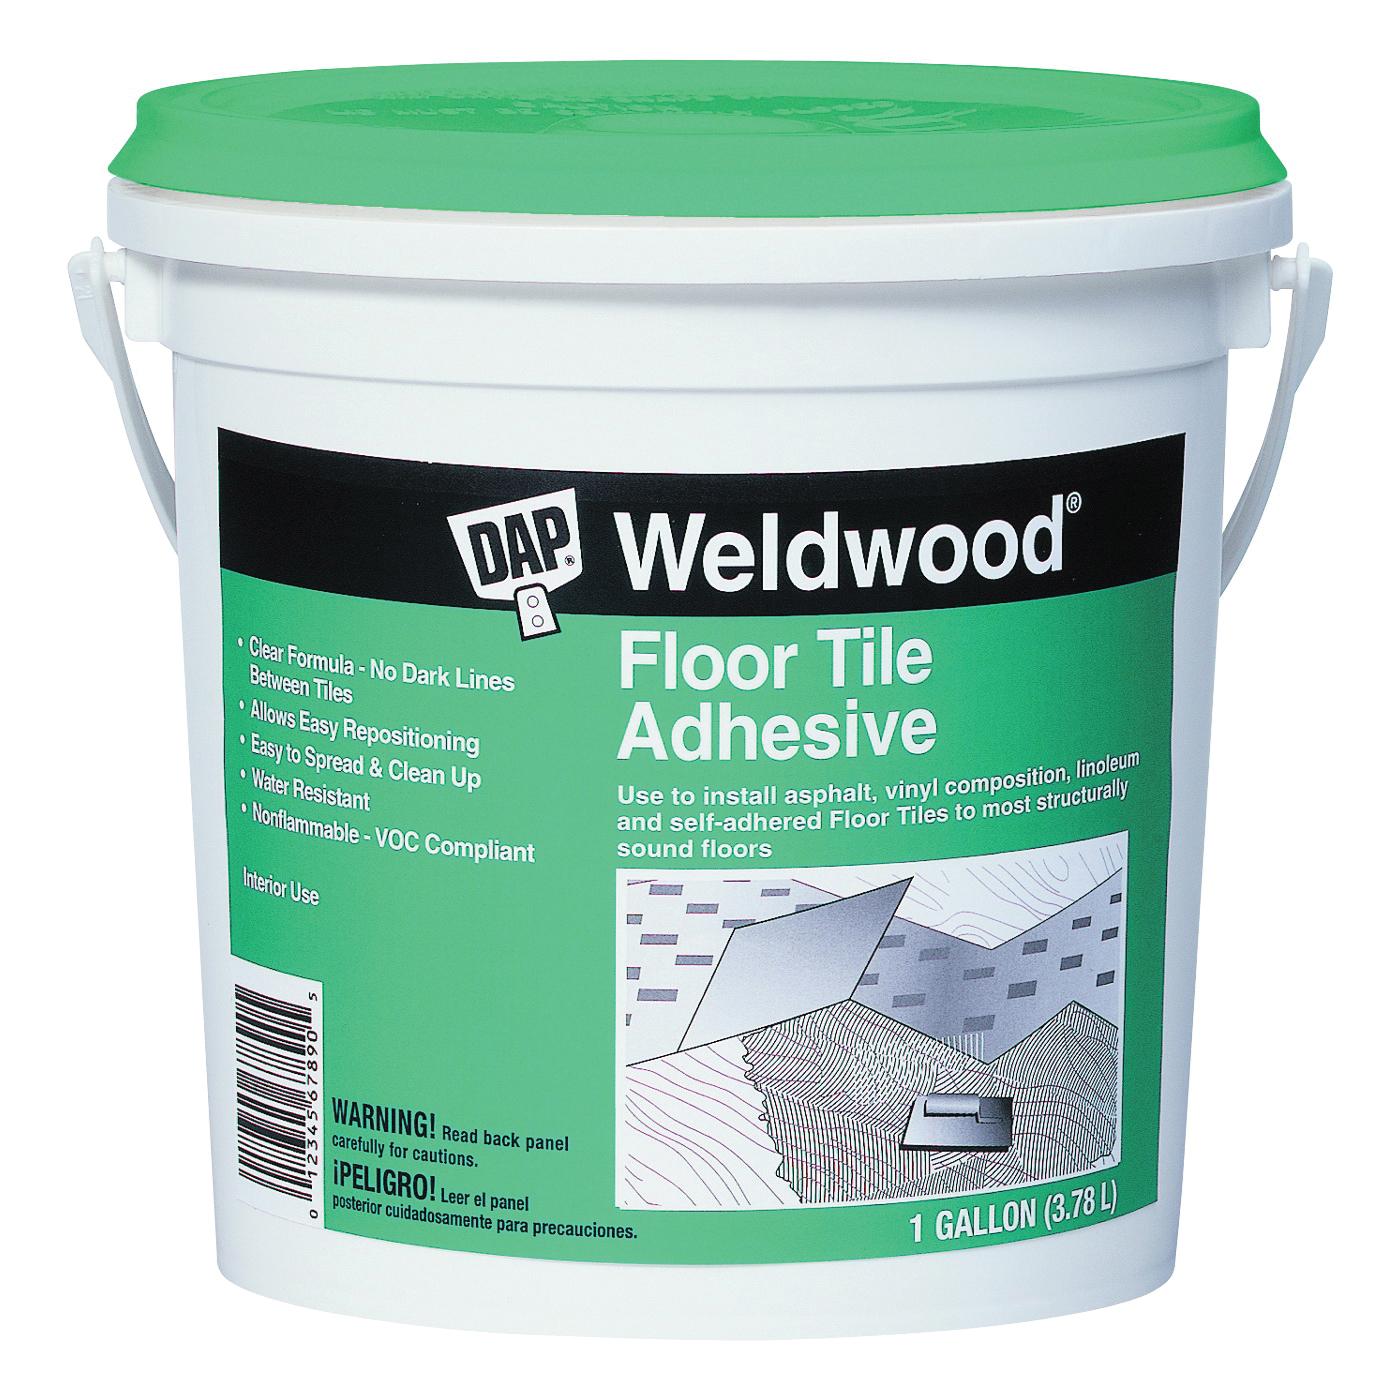 Picture of DAP Weldwood 00137 Floor Tile Adhesive, Paste, Slight, Clear, 1 gal Package, Pail